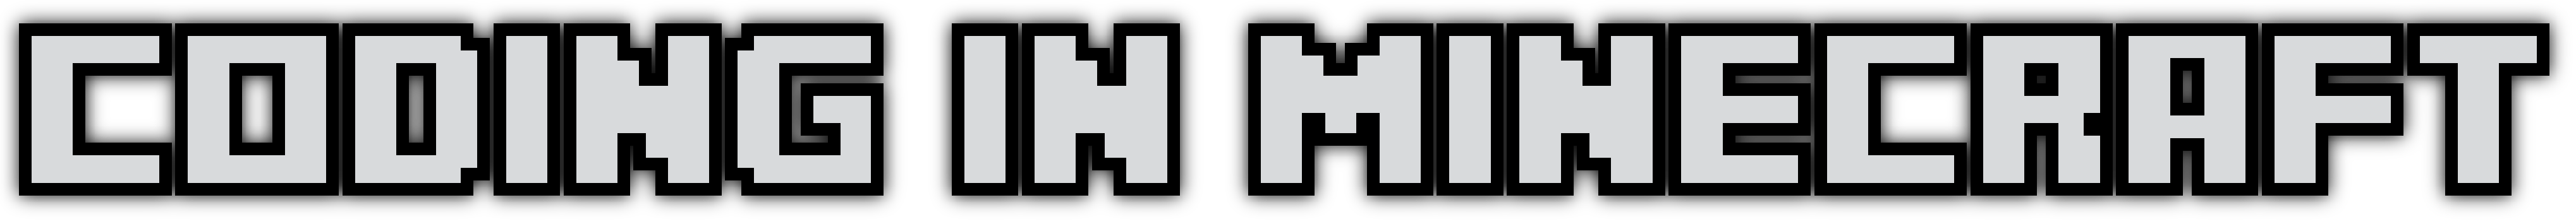 Coding in Minecraft